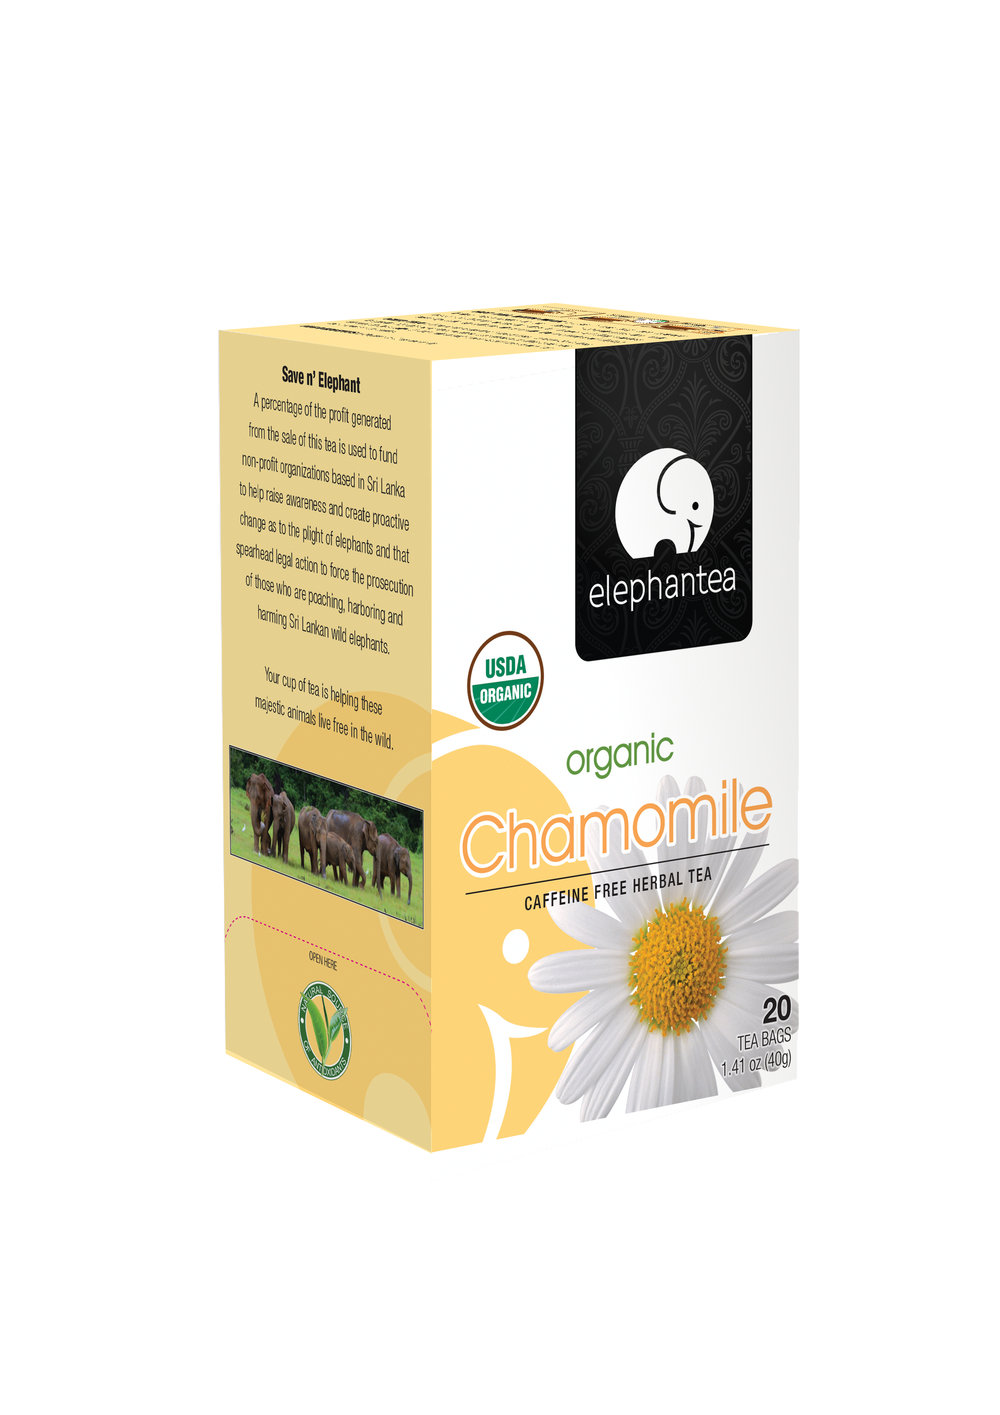 elephantea Organic Chamomile